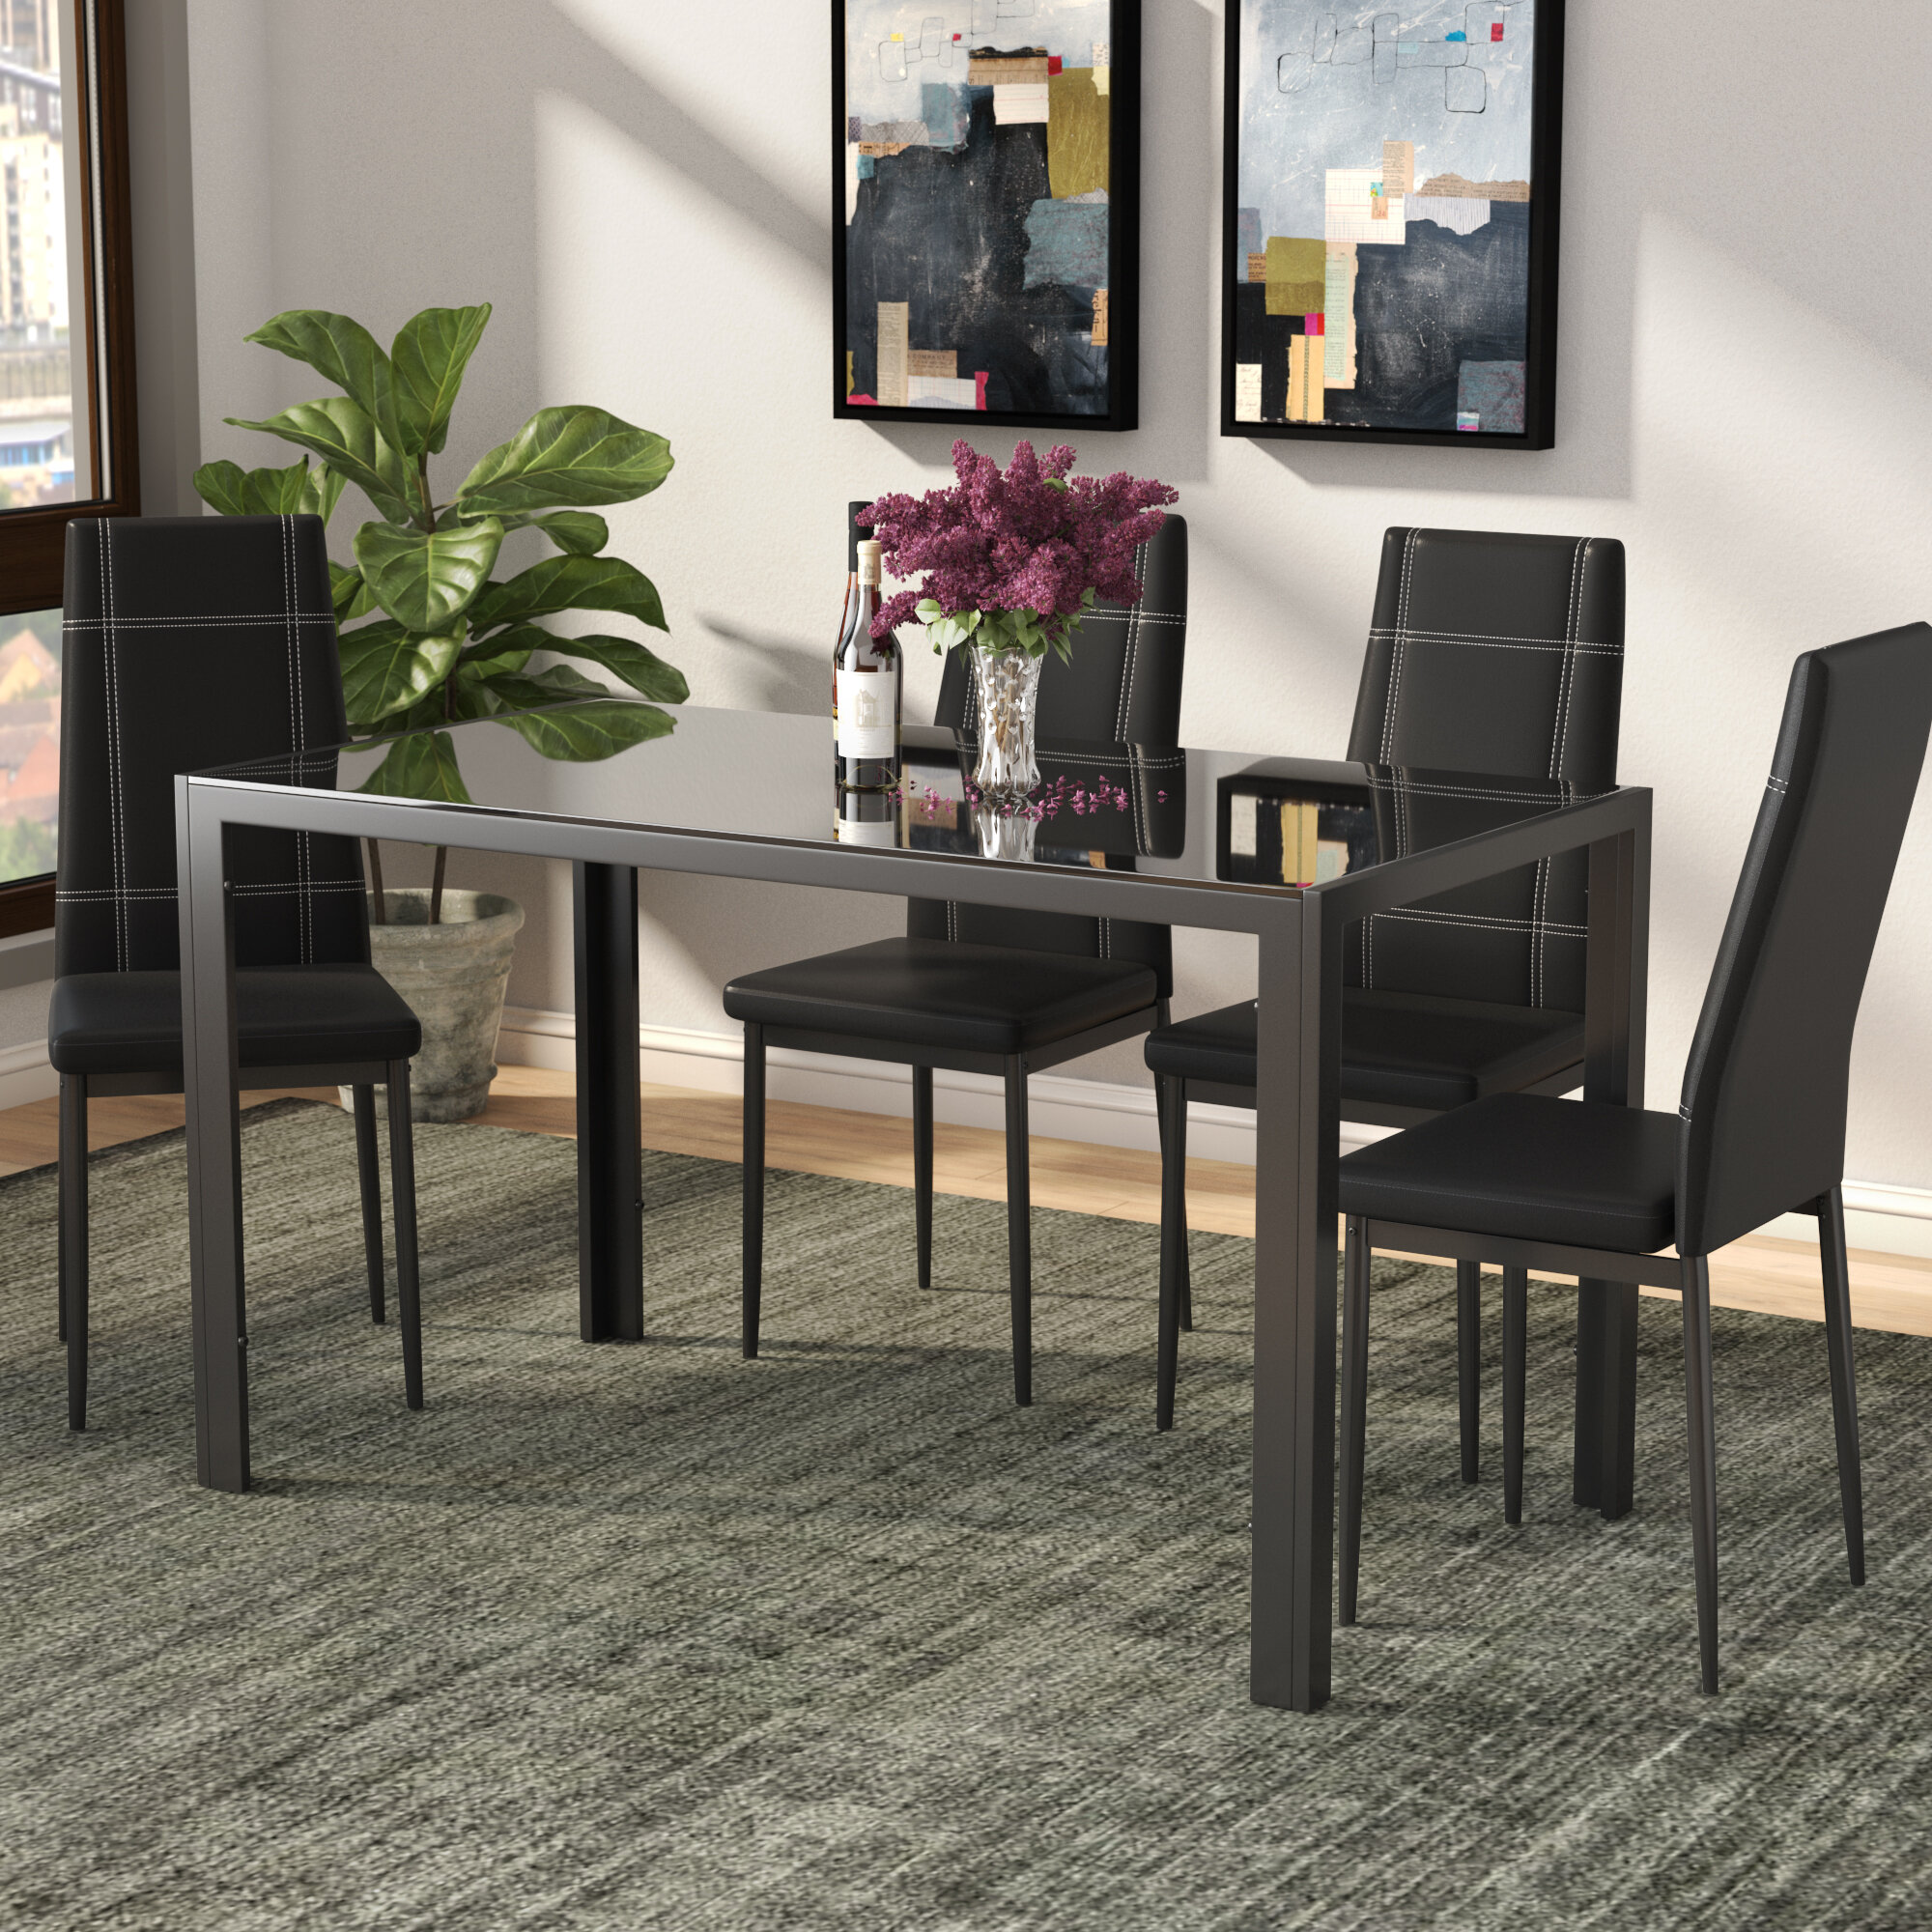 Ebern Designs Maynard 5 Piece Dining Set   Reviews  dde1747497e6